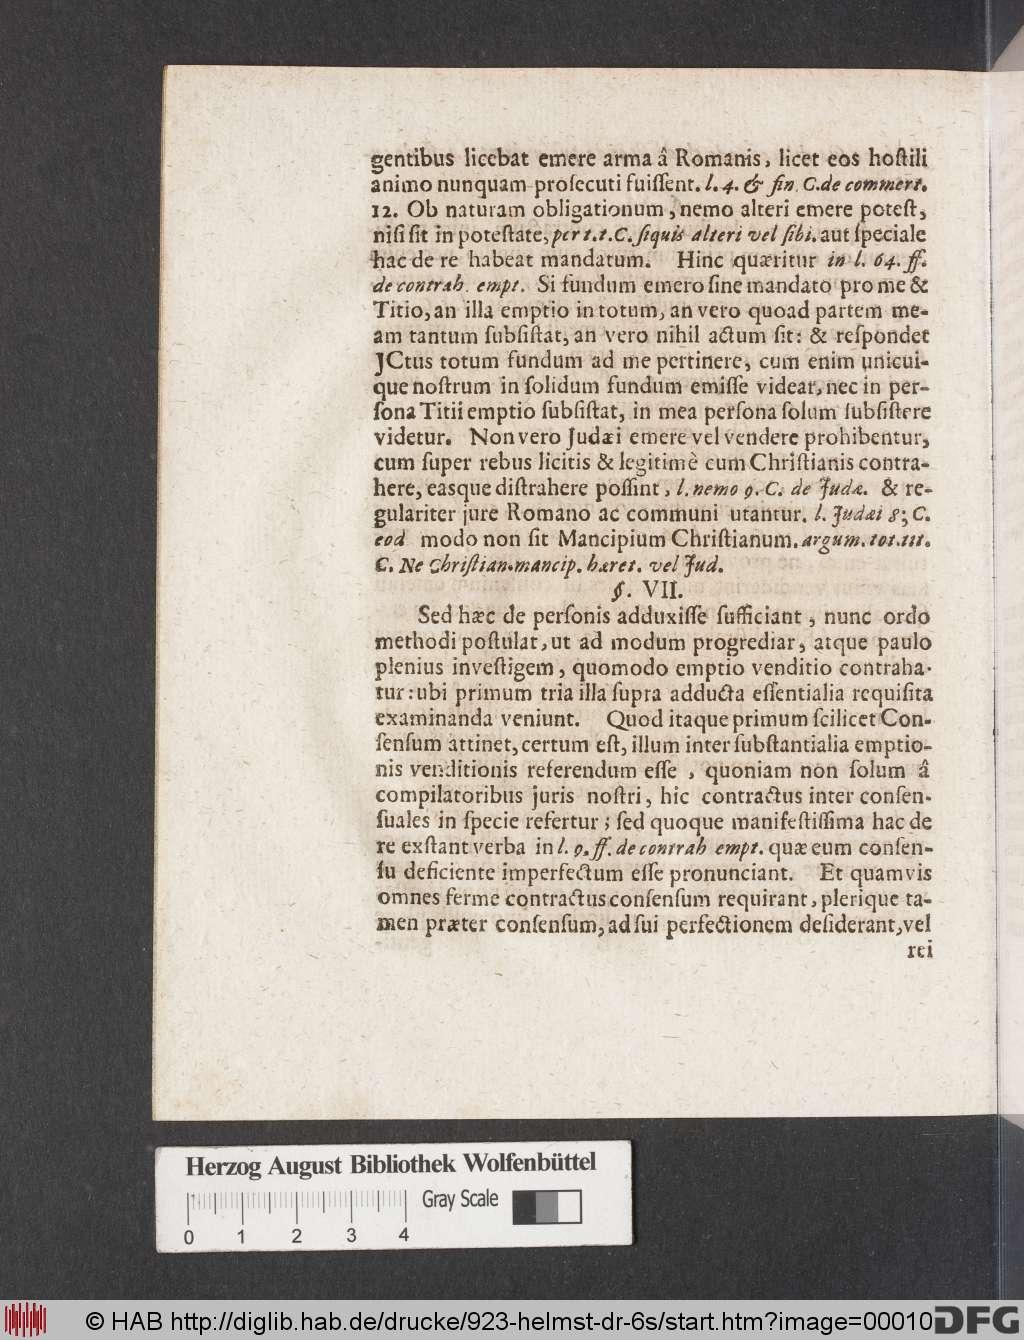 https://diglib.hab.de/drucke/923-helmst-dr-6s/00010.jpg